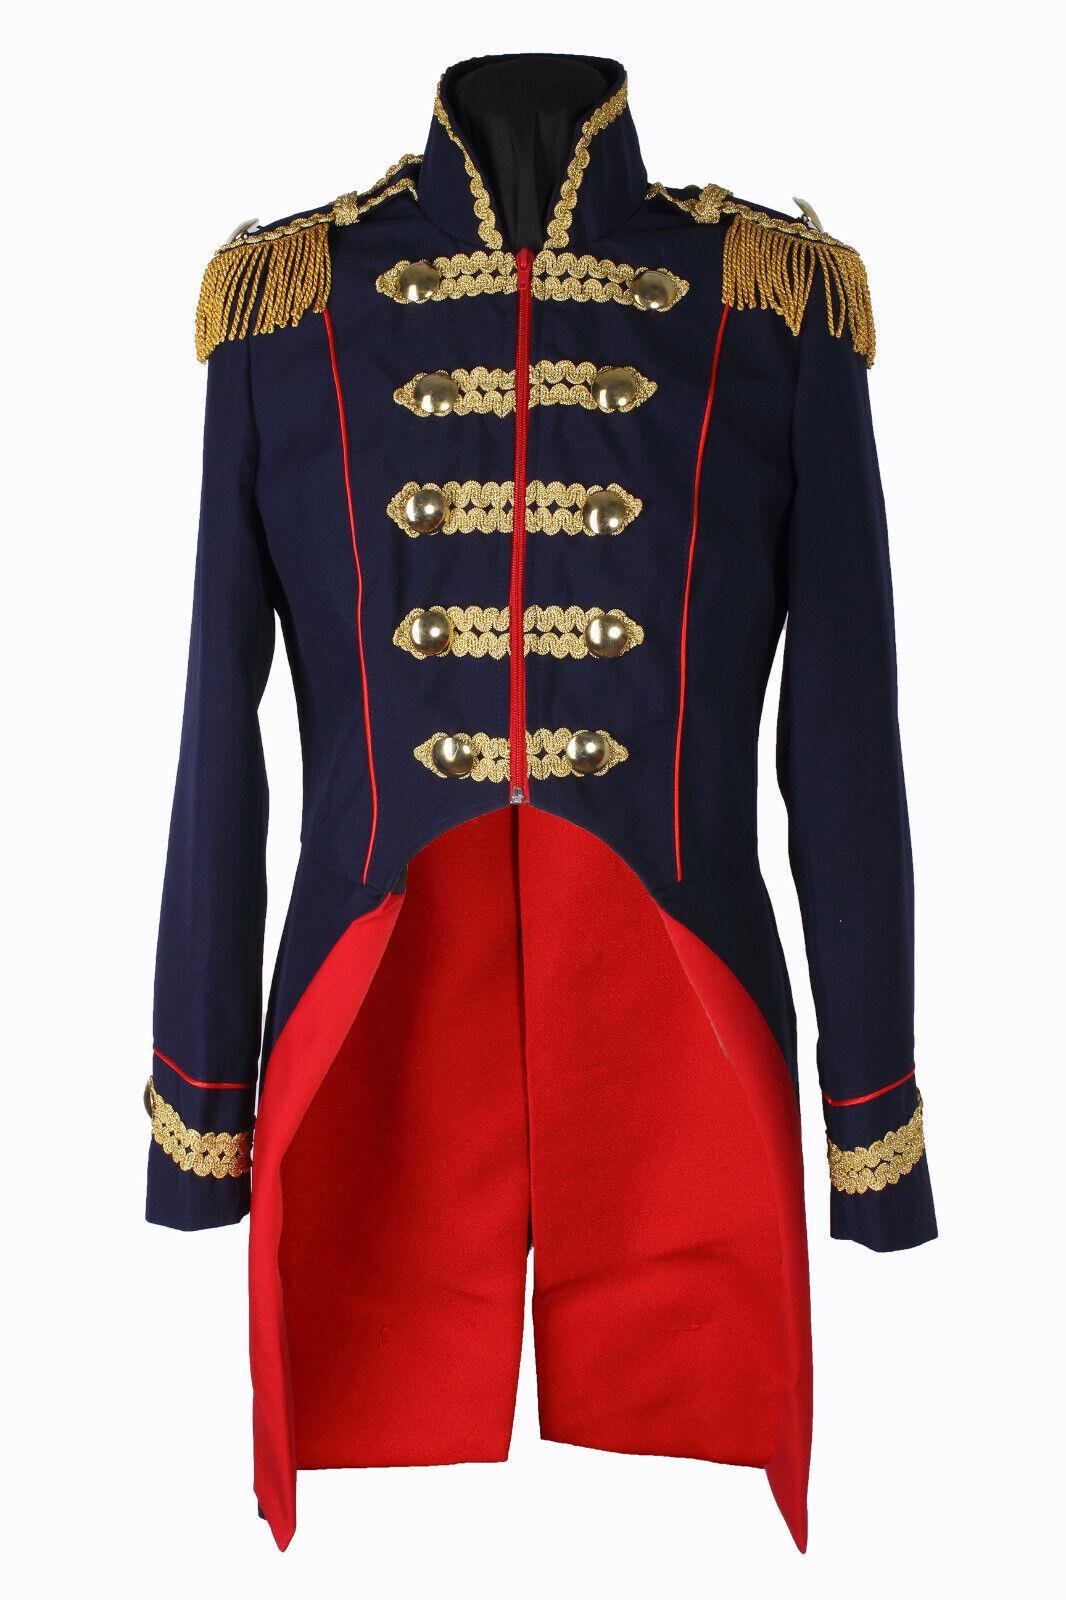 Damen Soldat Jacke Karnevalskostüm Uniform Fasching Gehrock Köln 36-54 Blau